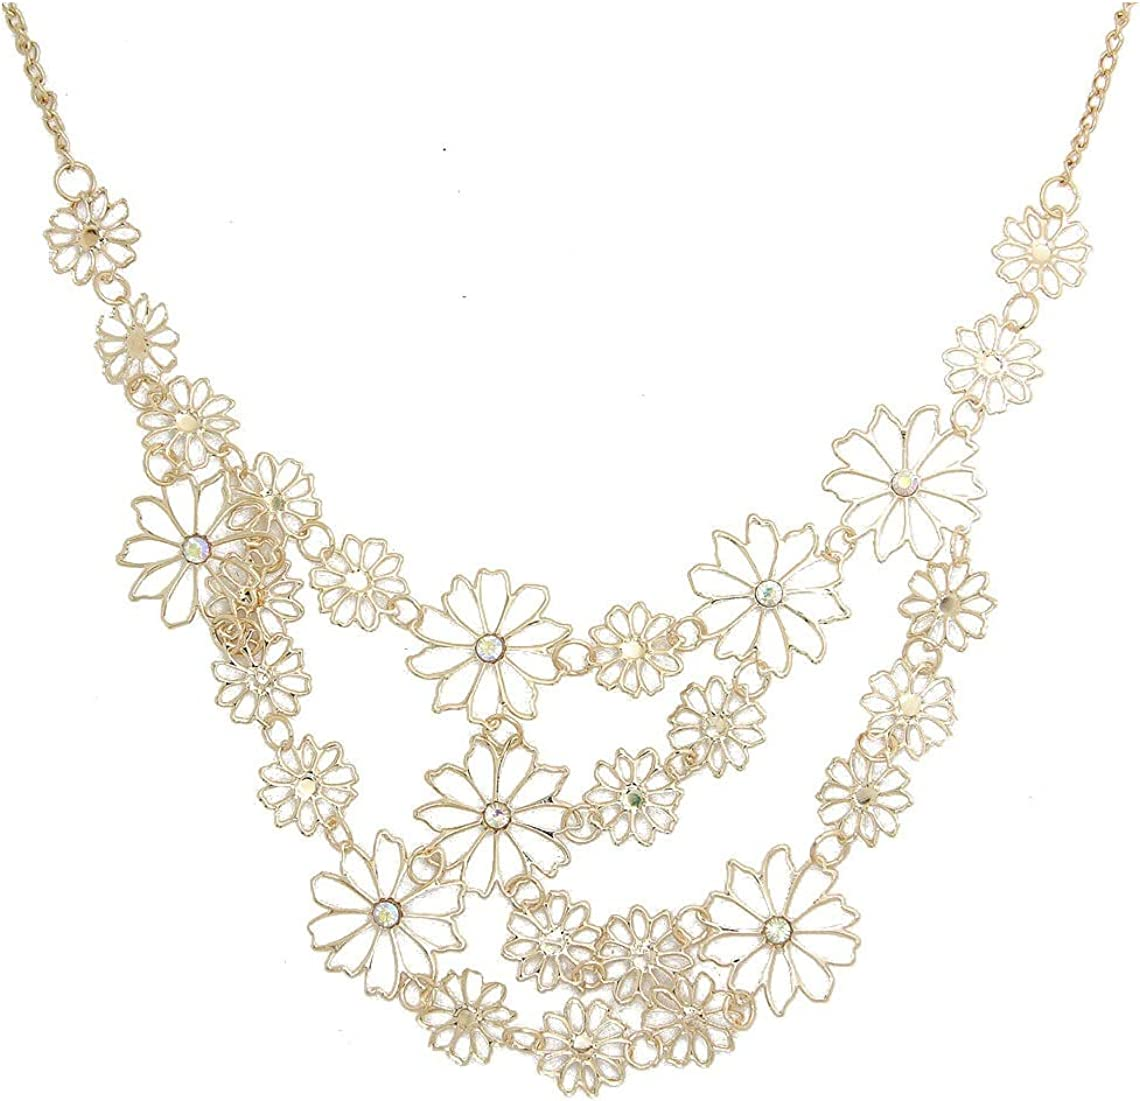 KOEDLN Hollow Camellia Daisy Flower Layers Collar Necklace Wedding Bride Jewelry